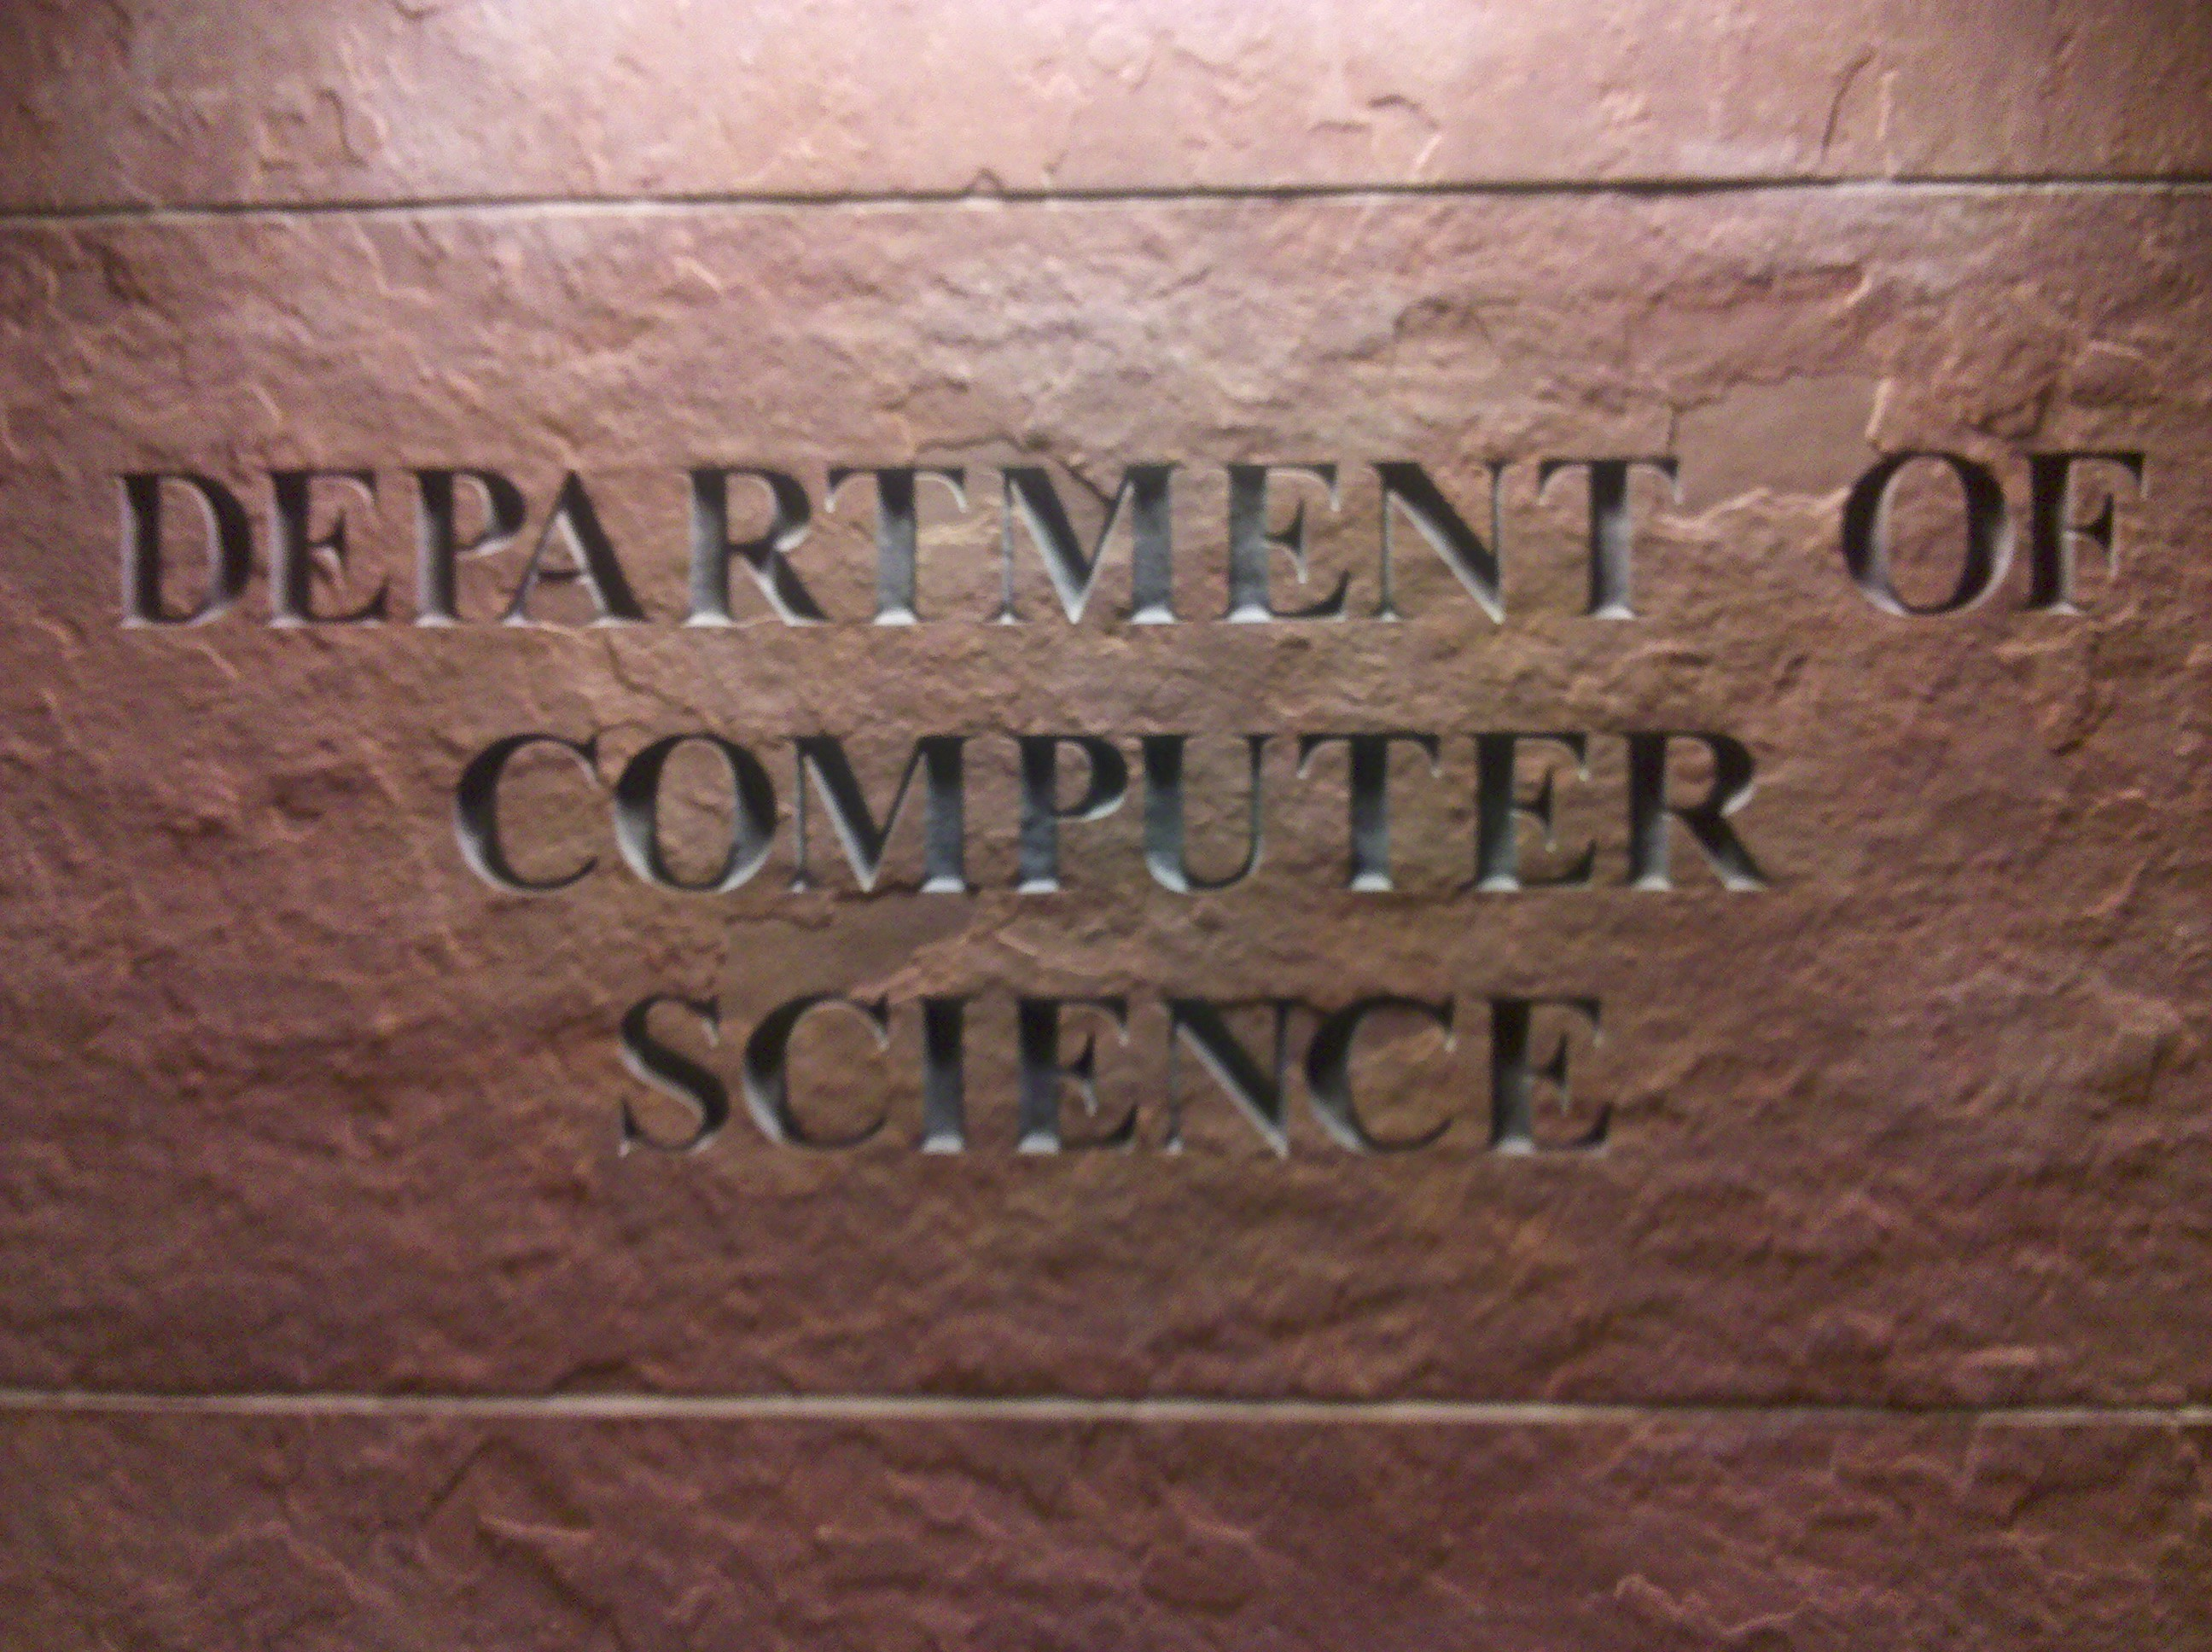 1%2f16%2fcu computer science